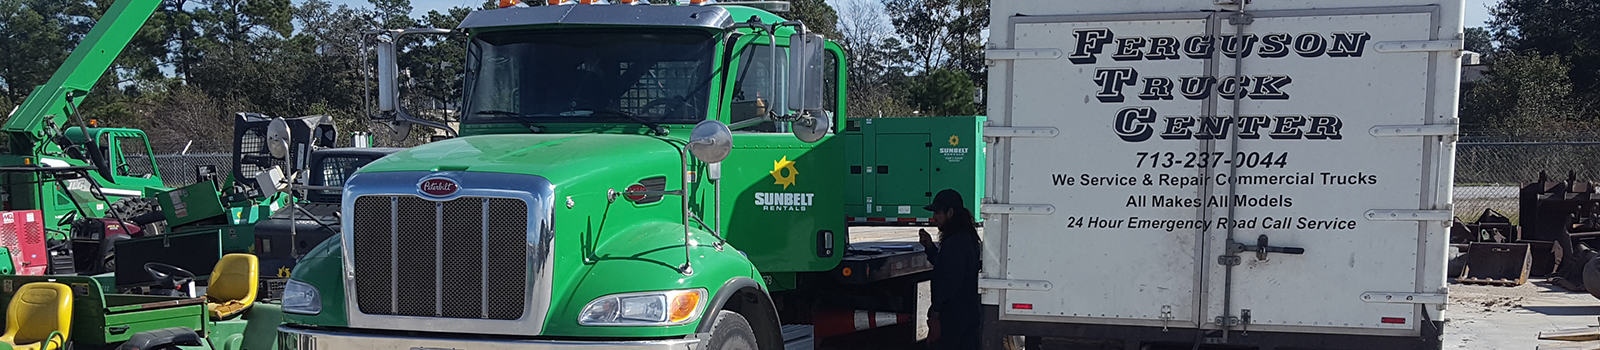 Ferguson Mobile Truck Repair Service